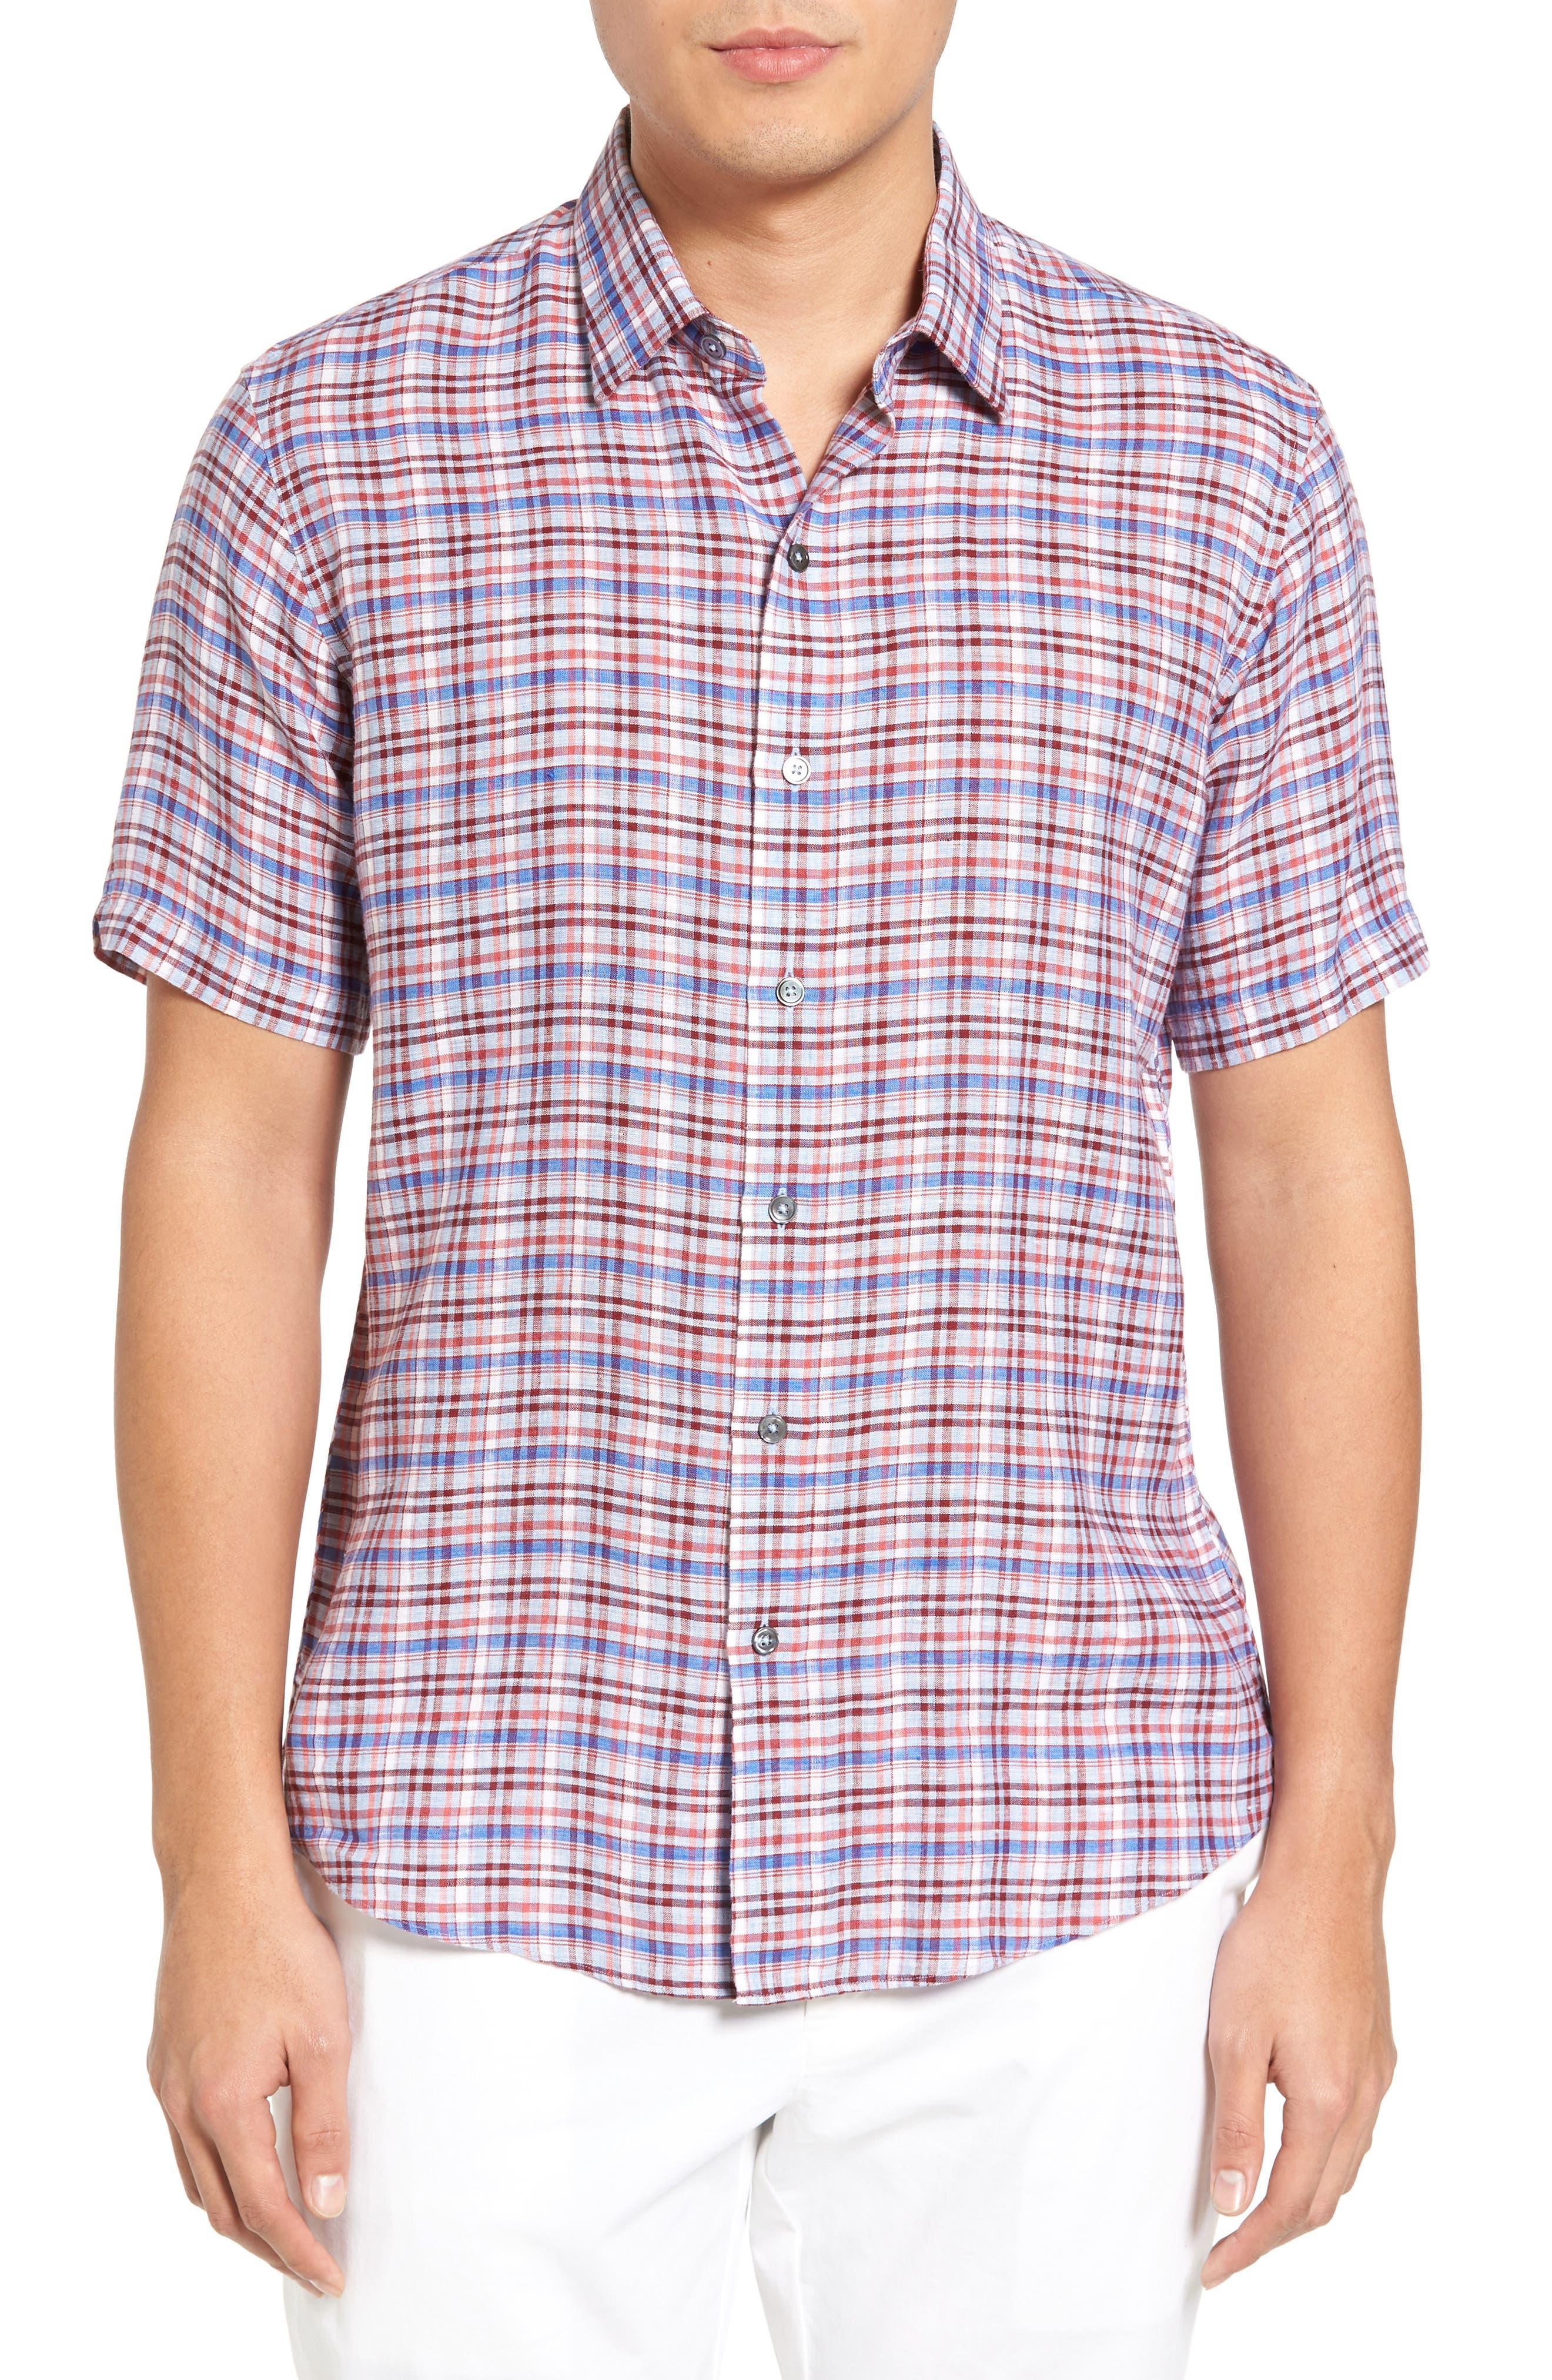 Alternate Image 1 Selected - Zachary Prell Bean Trim Fit Plaid Linen Sport Shirt